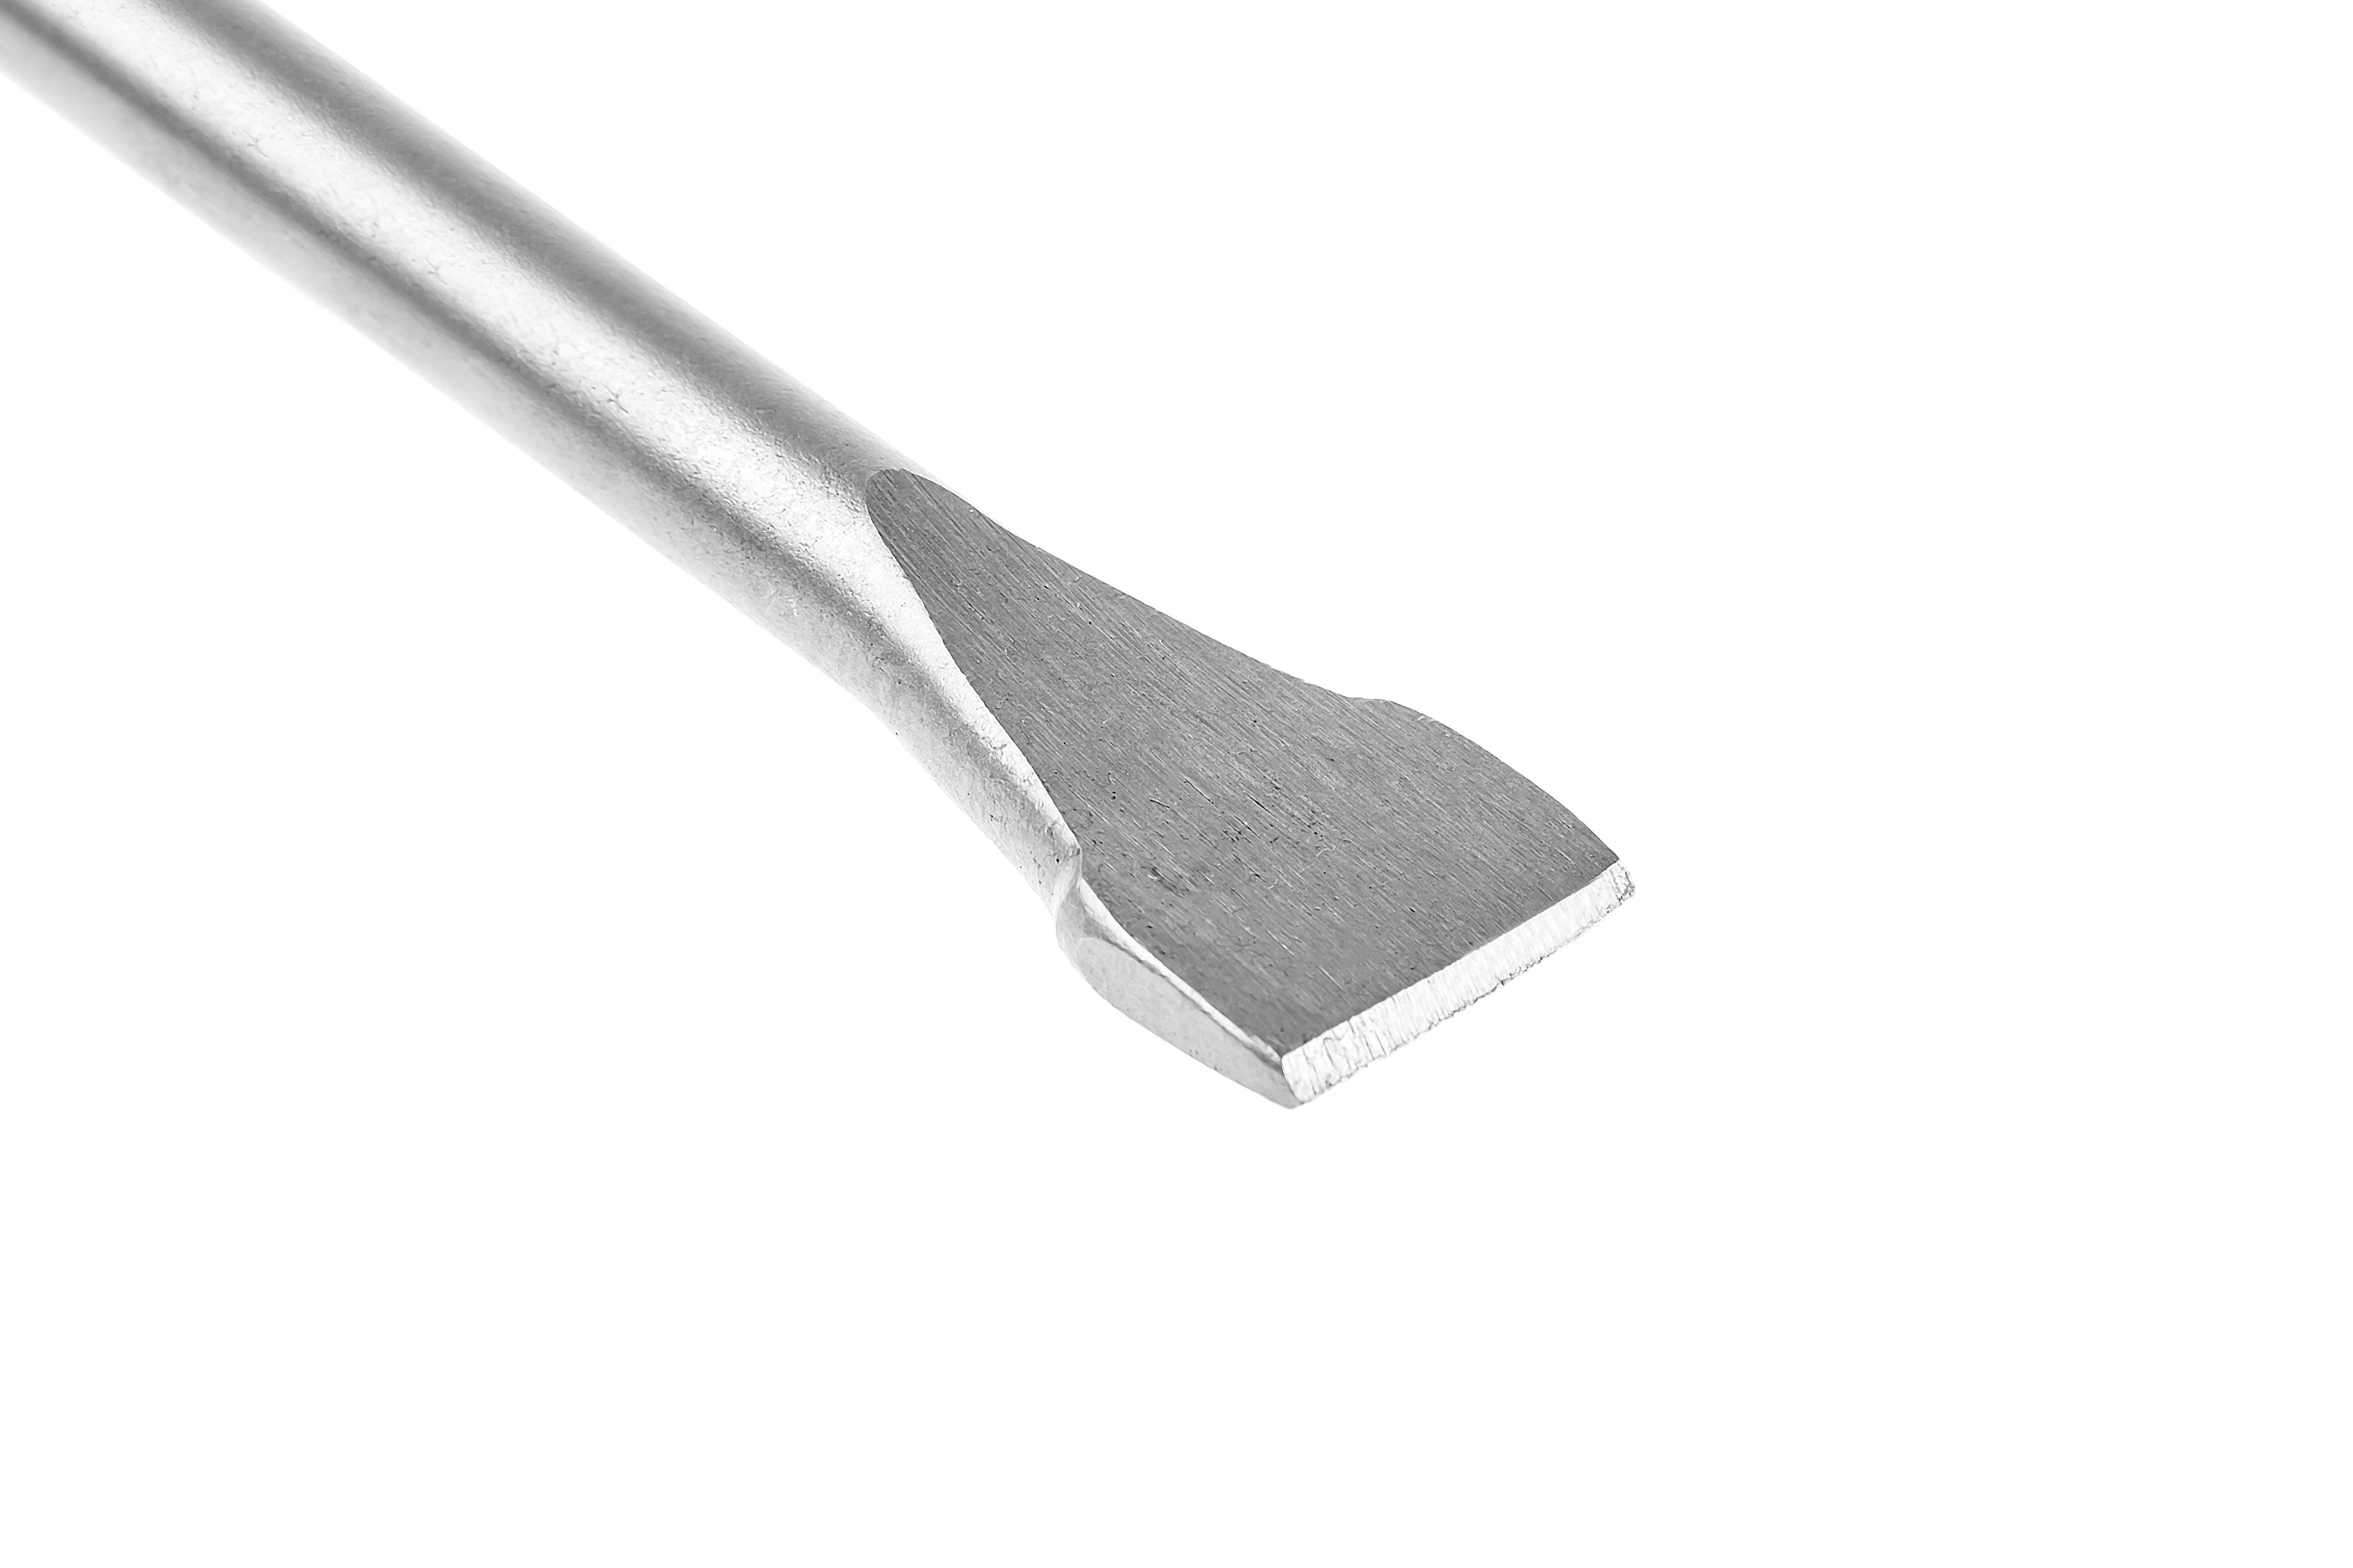 Зубило Hammer Dr ch sds-max плоское 18*280*40мм зубило sturm 9018 sds f40x250